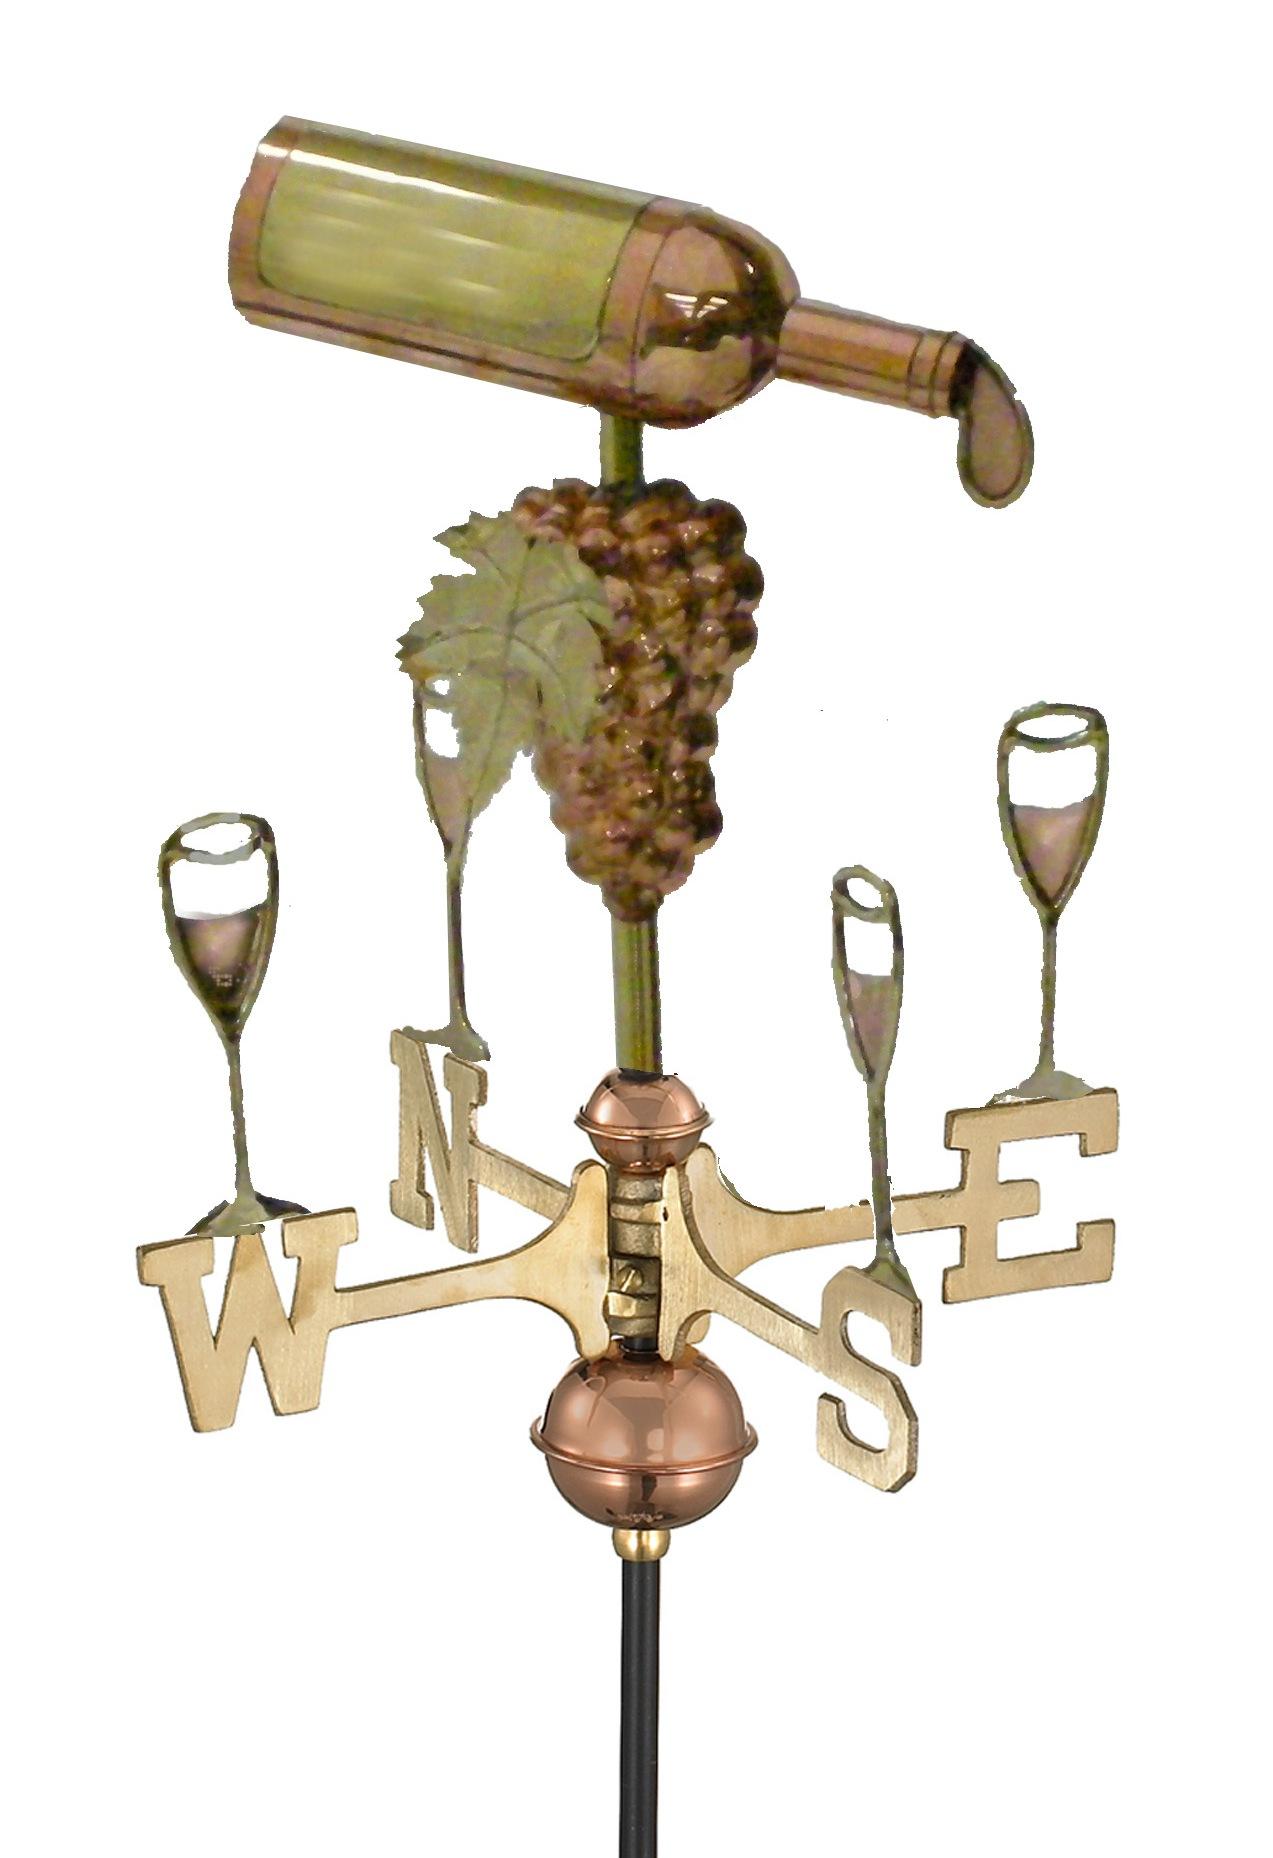 Polished Copper Wine Bottle Weather Vane